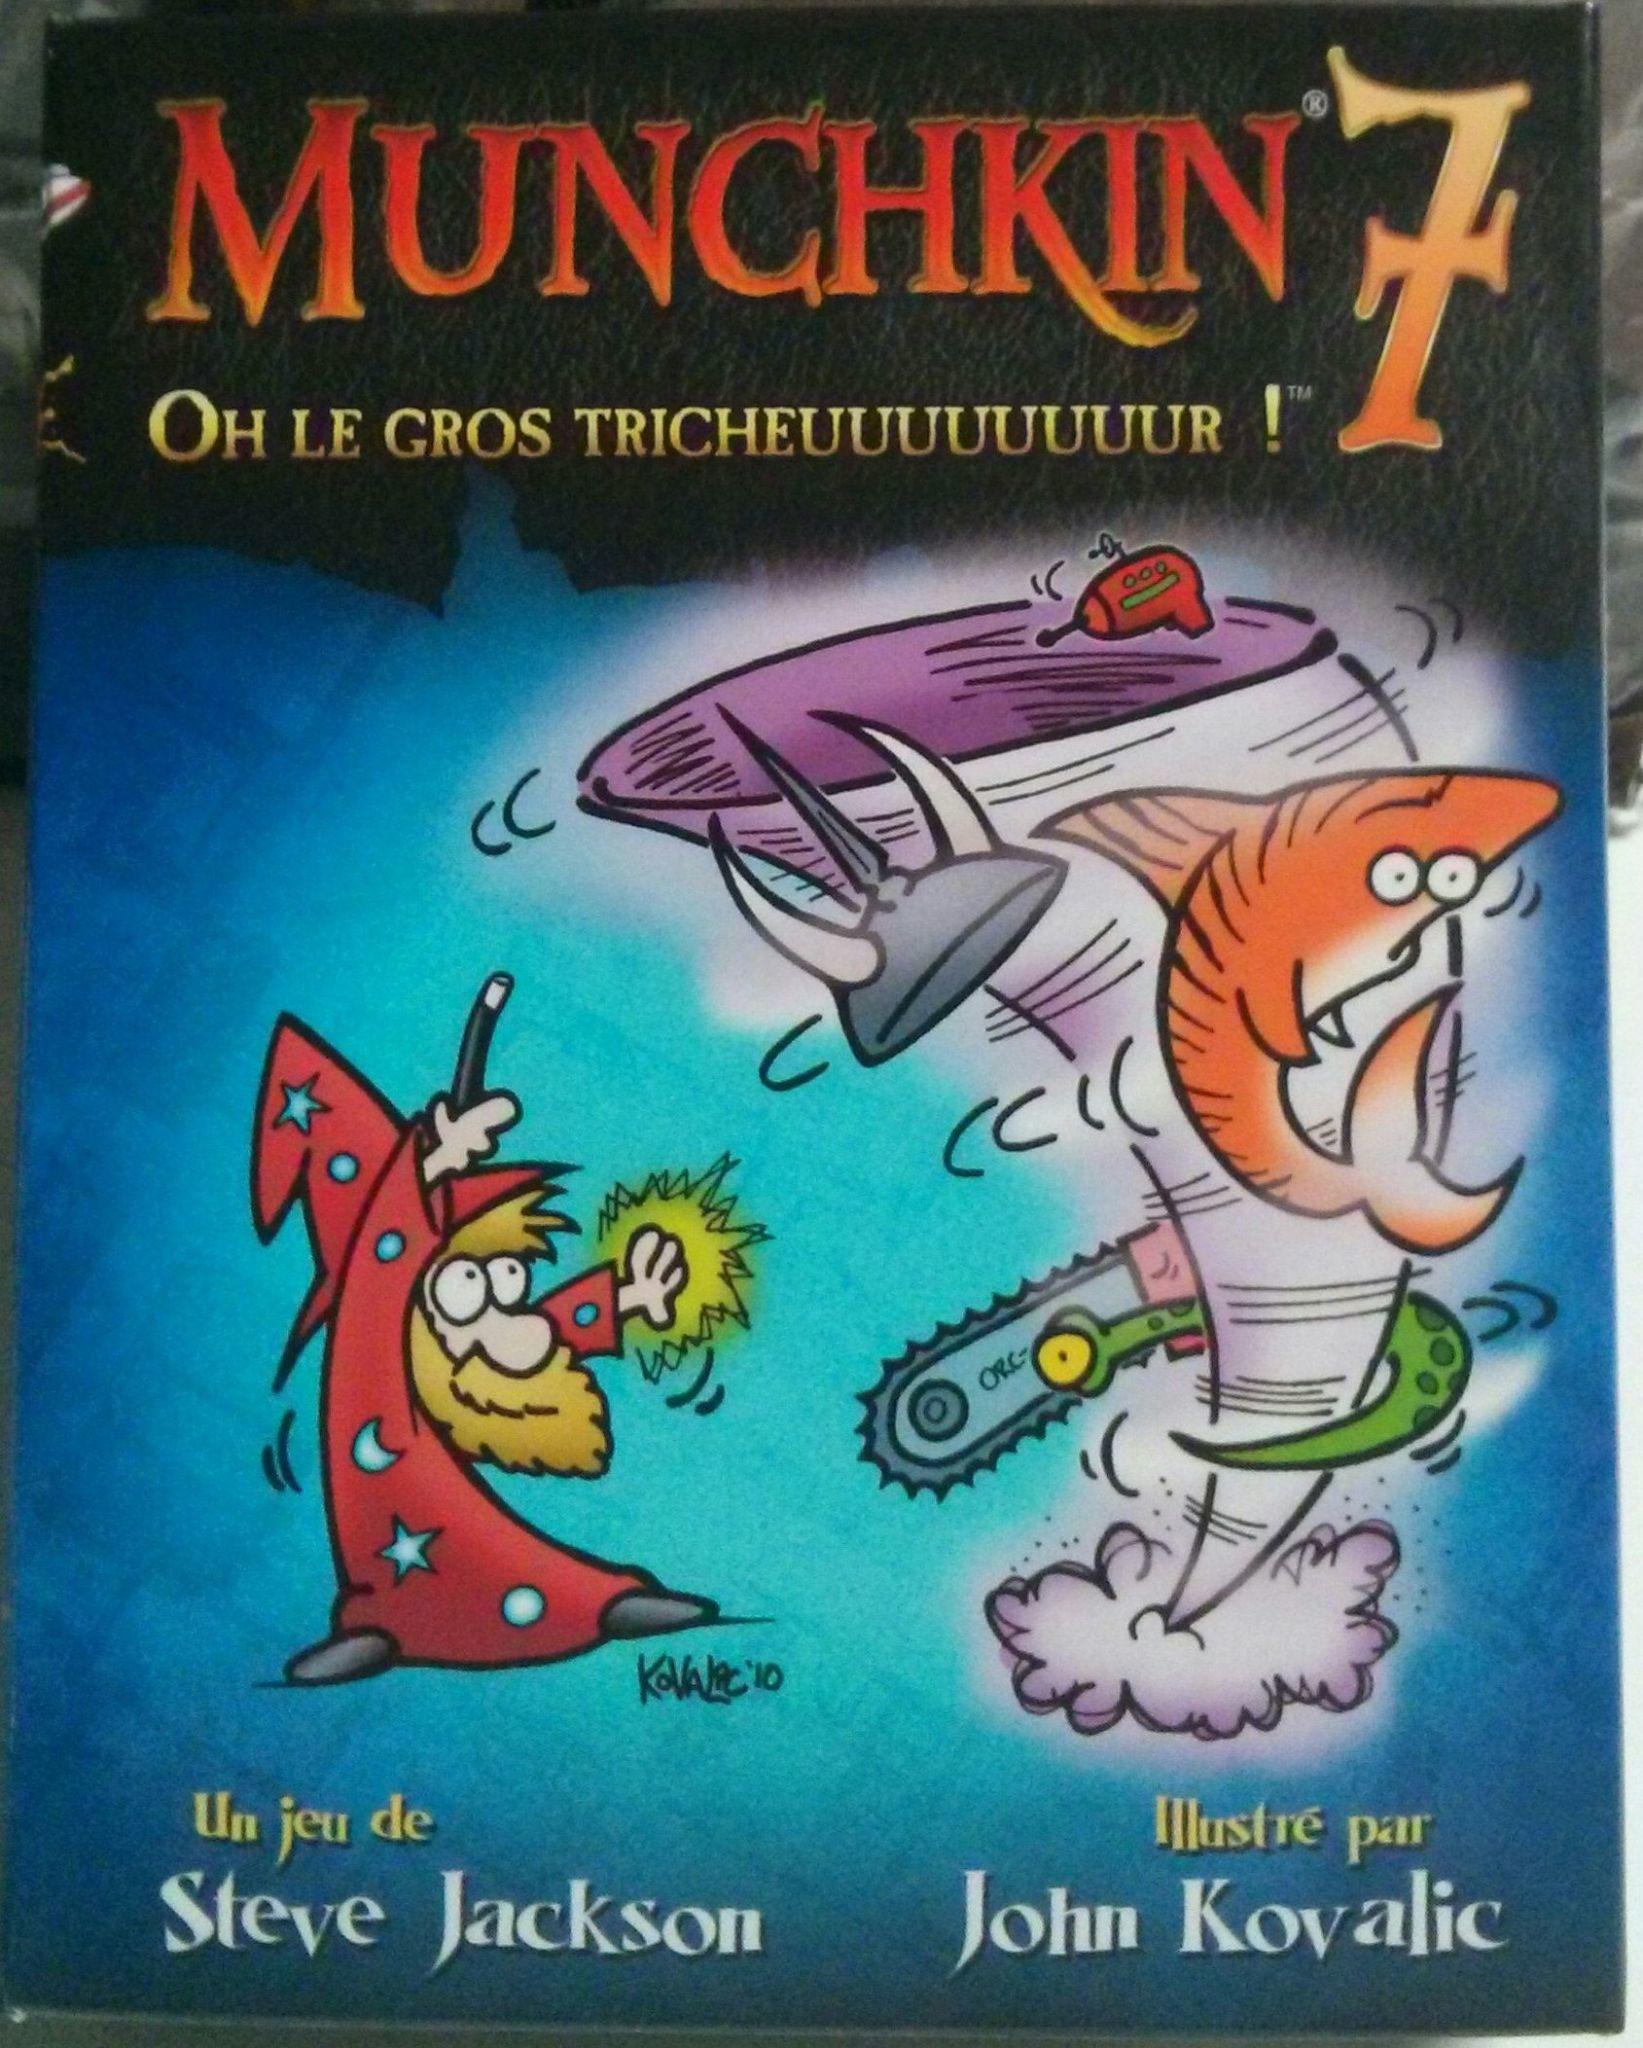 Munchkin 7: Oh Le Gros Tricheuuuuuuuur!